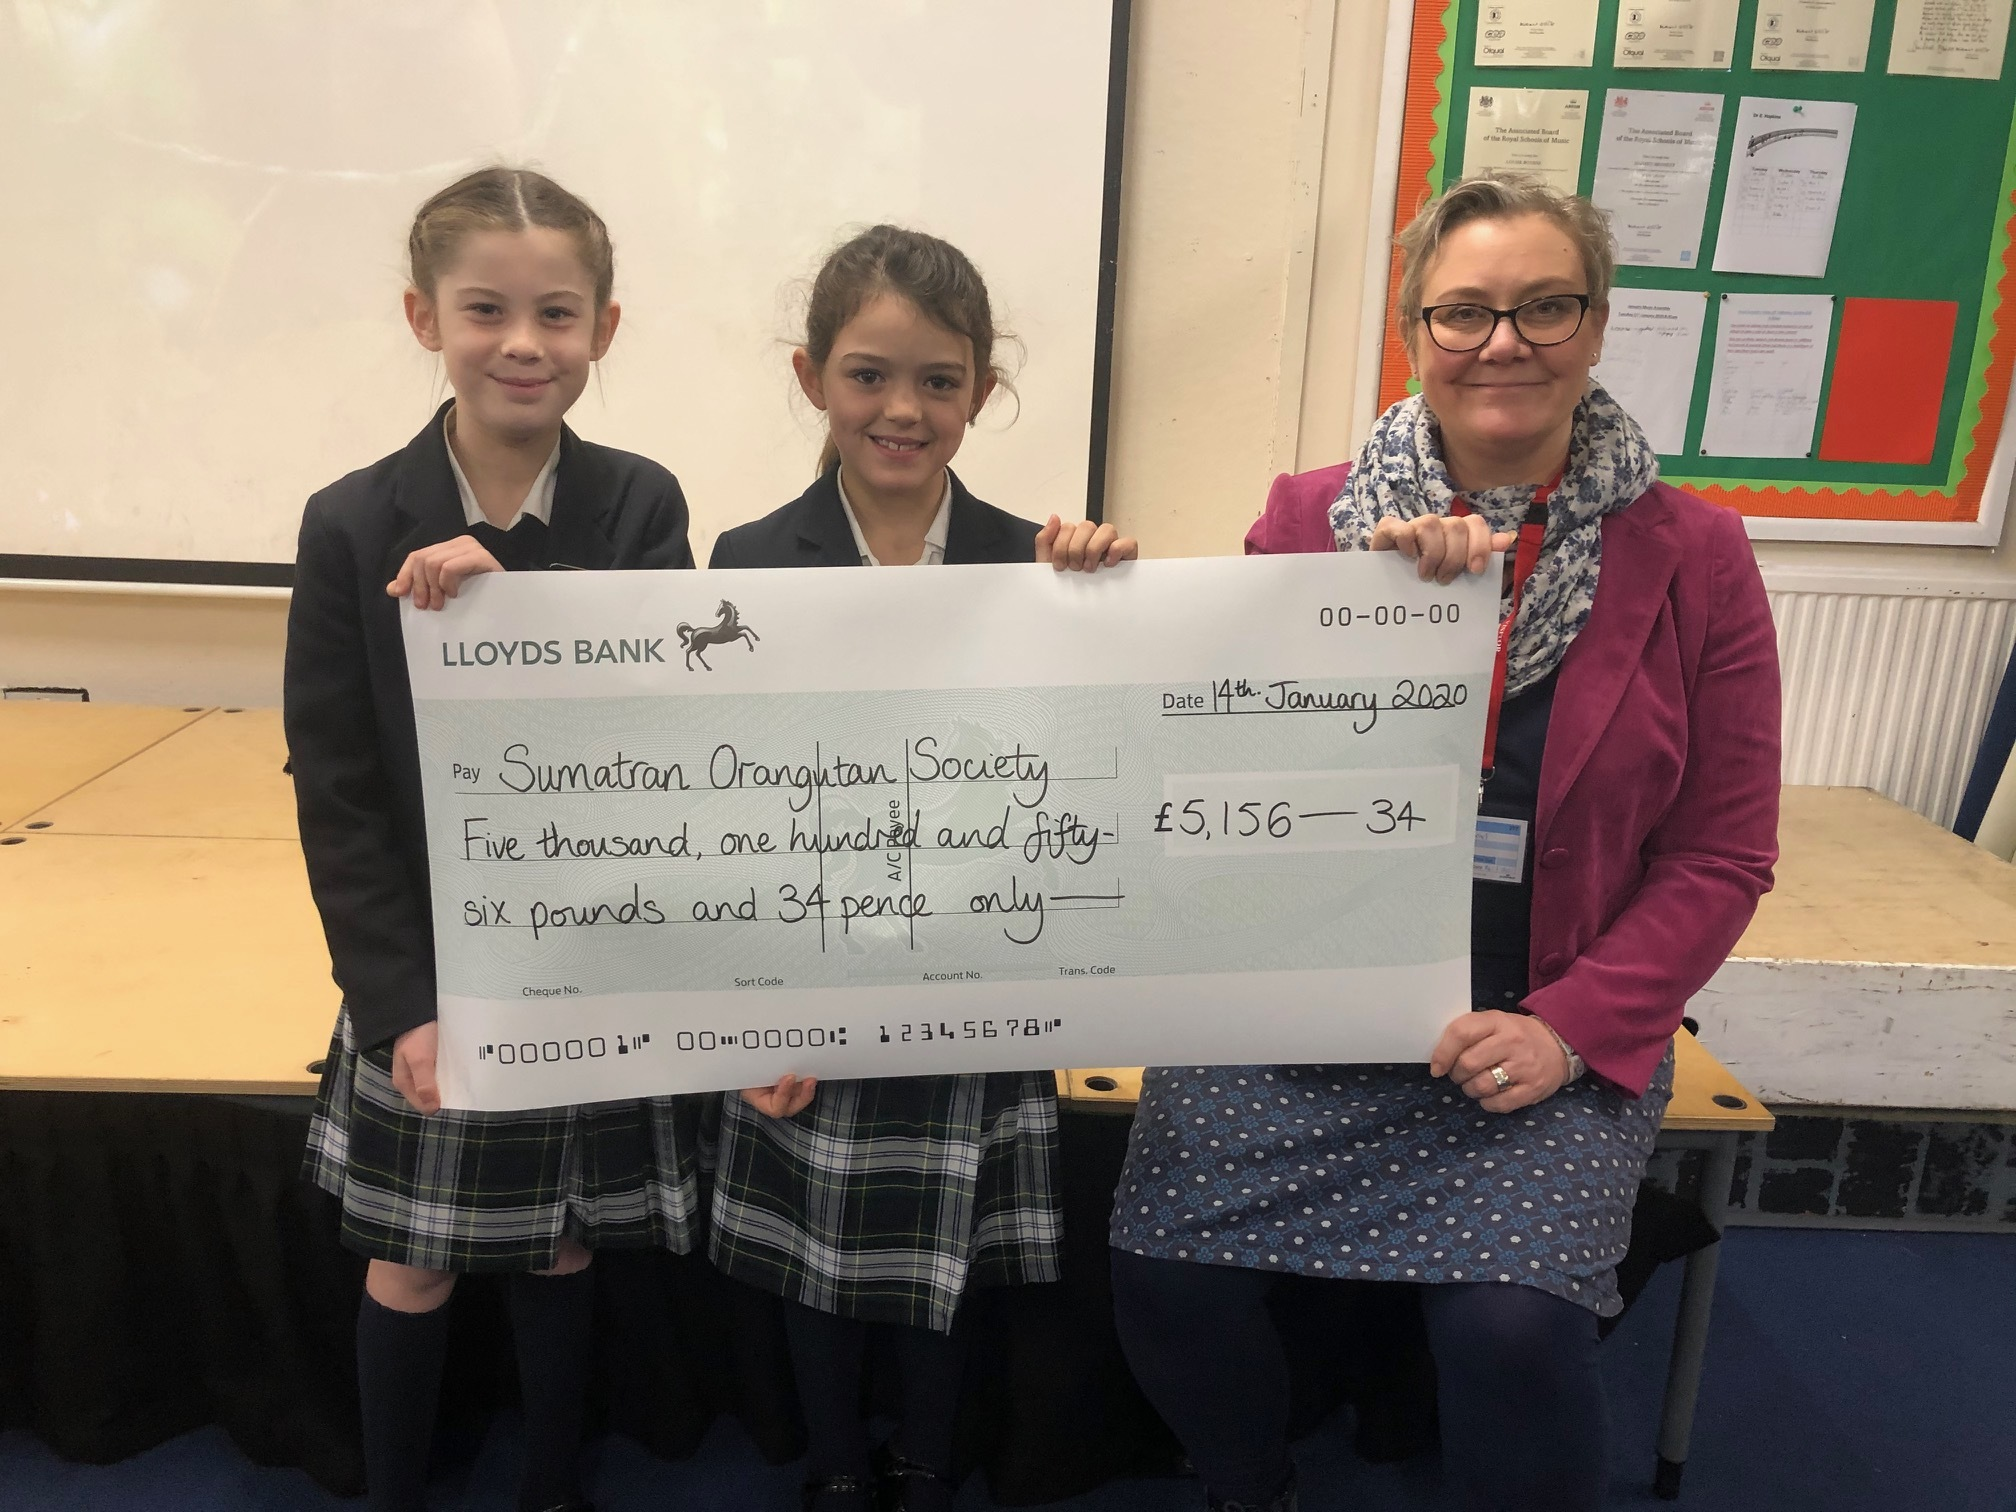 They raised over £4,000 for the Sumatran Orangutan Society